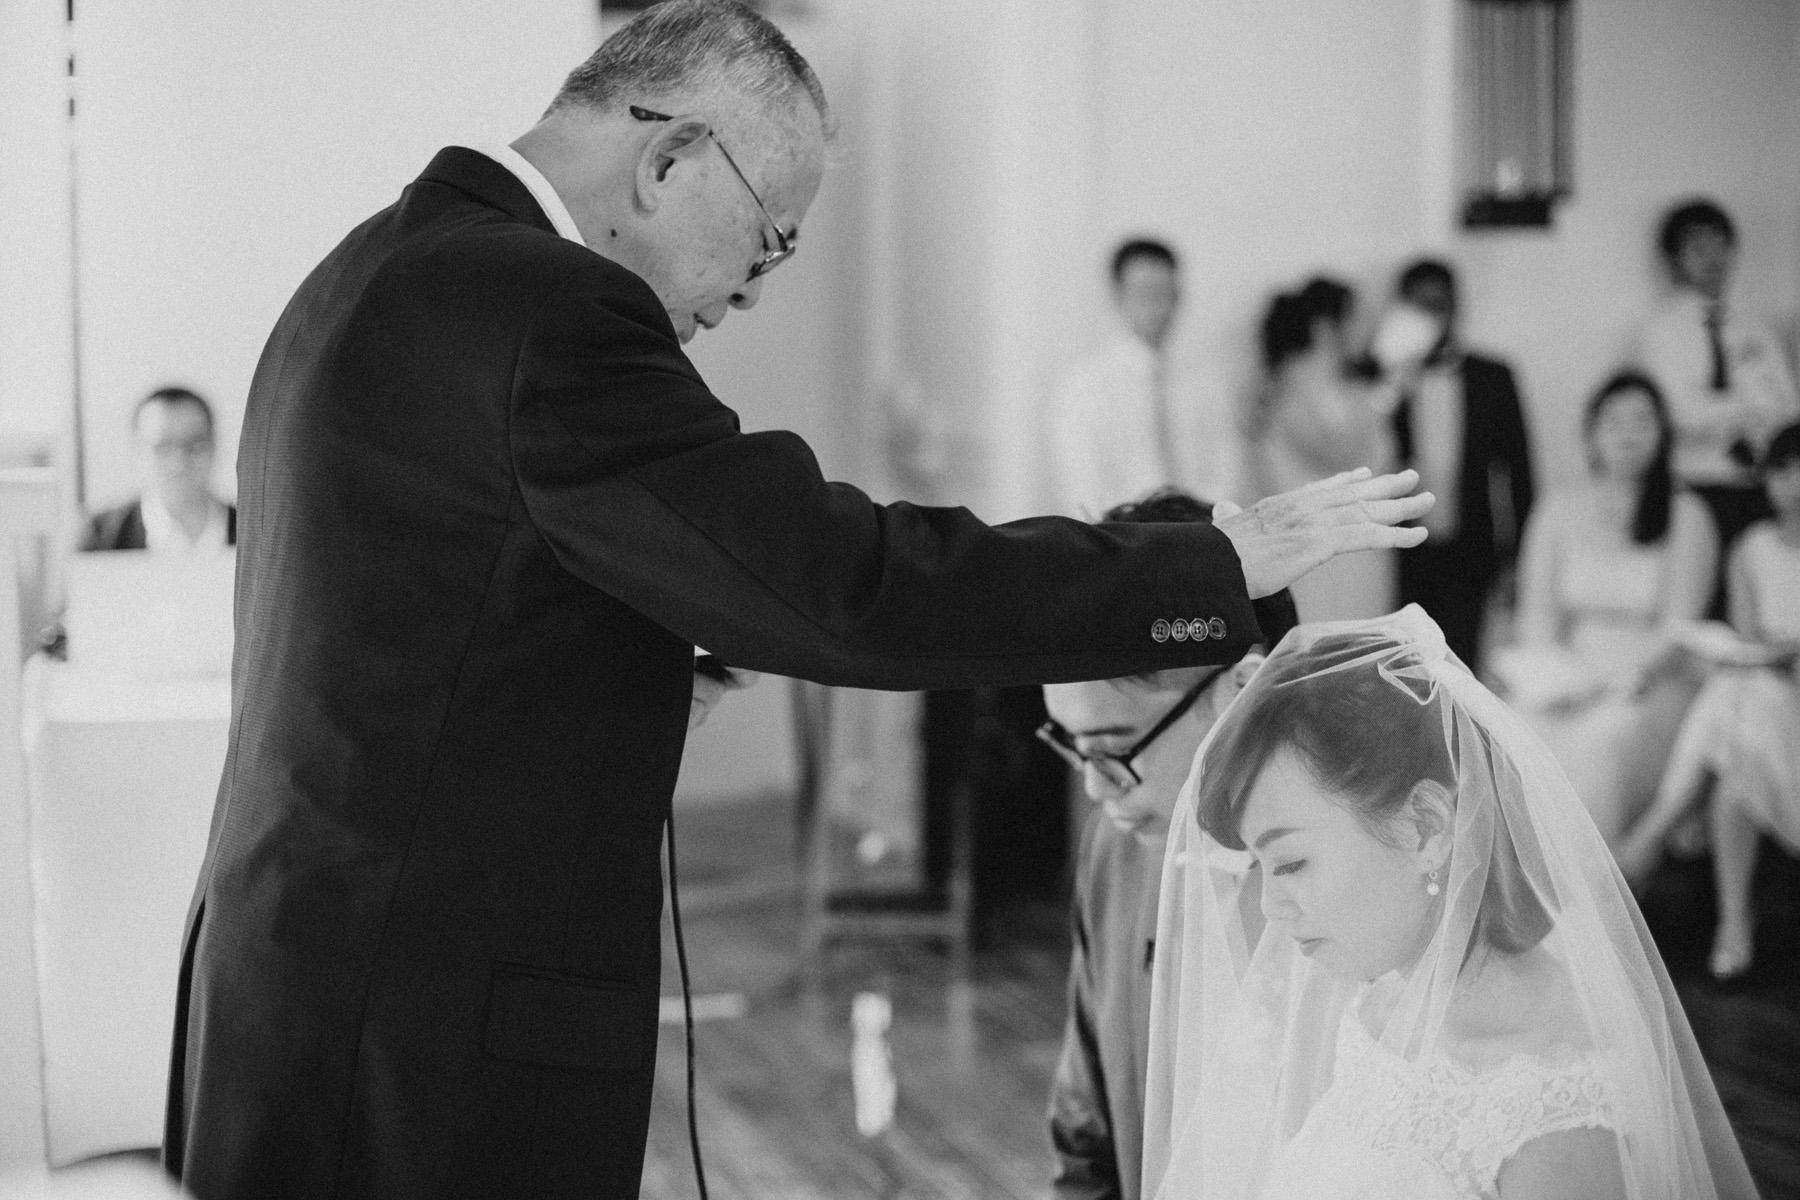 singapore-wedding-travel-photographer-faith-alvin-wedding-wmt-42.jpg